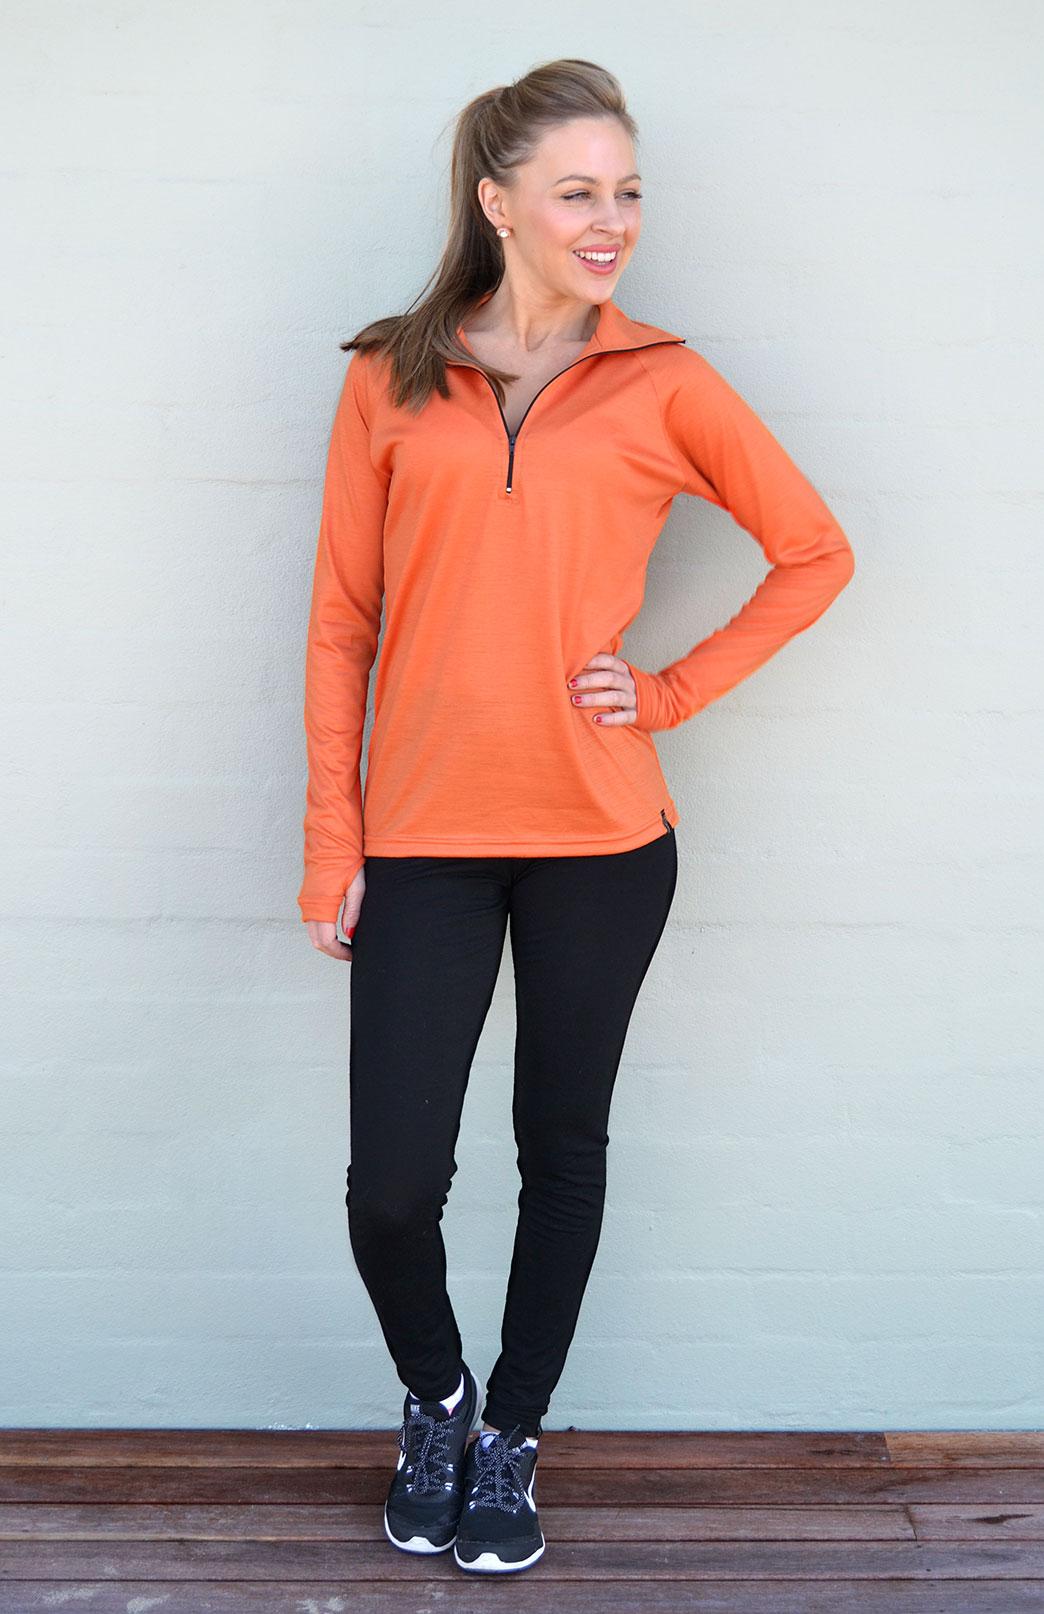 Zip Neck Top - Ultralight (170g) - Women's Bright Orange Wool Ultralight Zip Neck Pullover Style Top with Thumb Holes - Smitten Merino Tasmania Australia